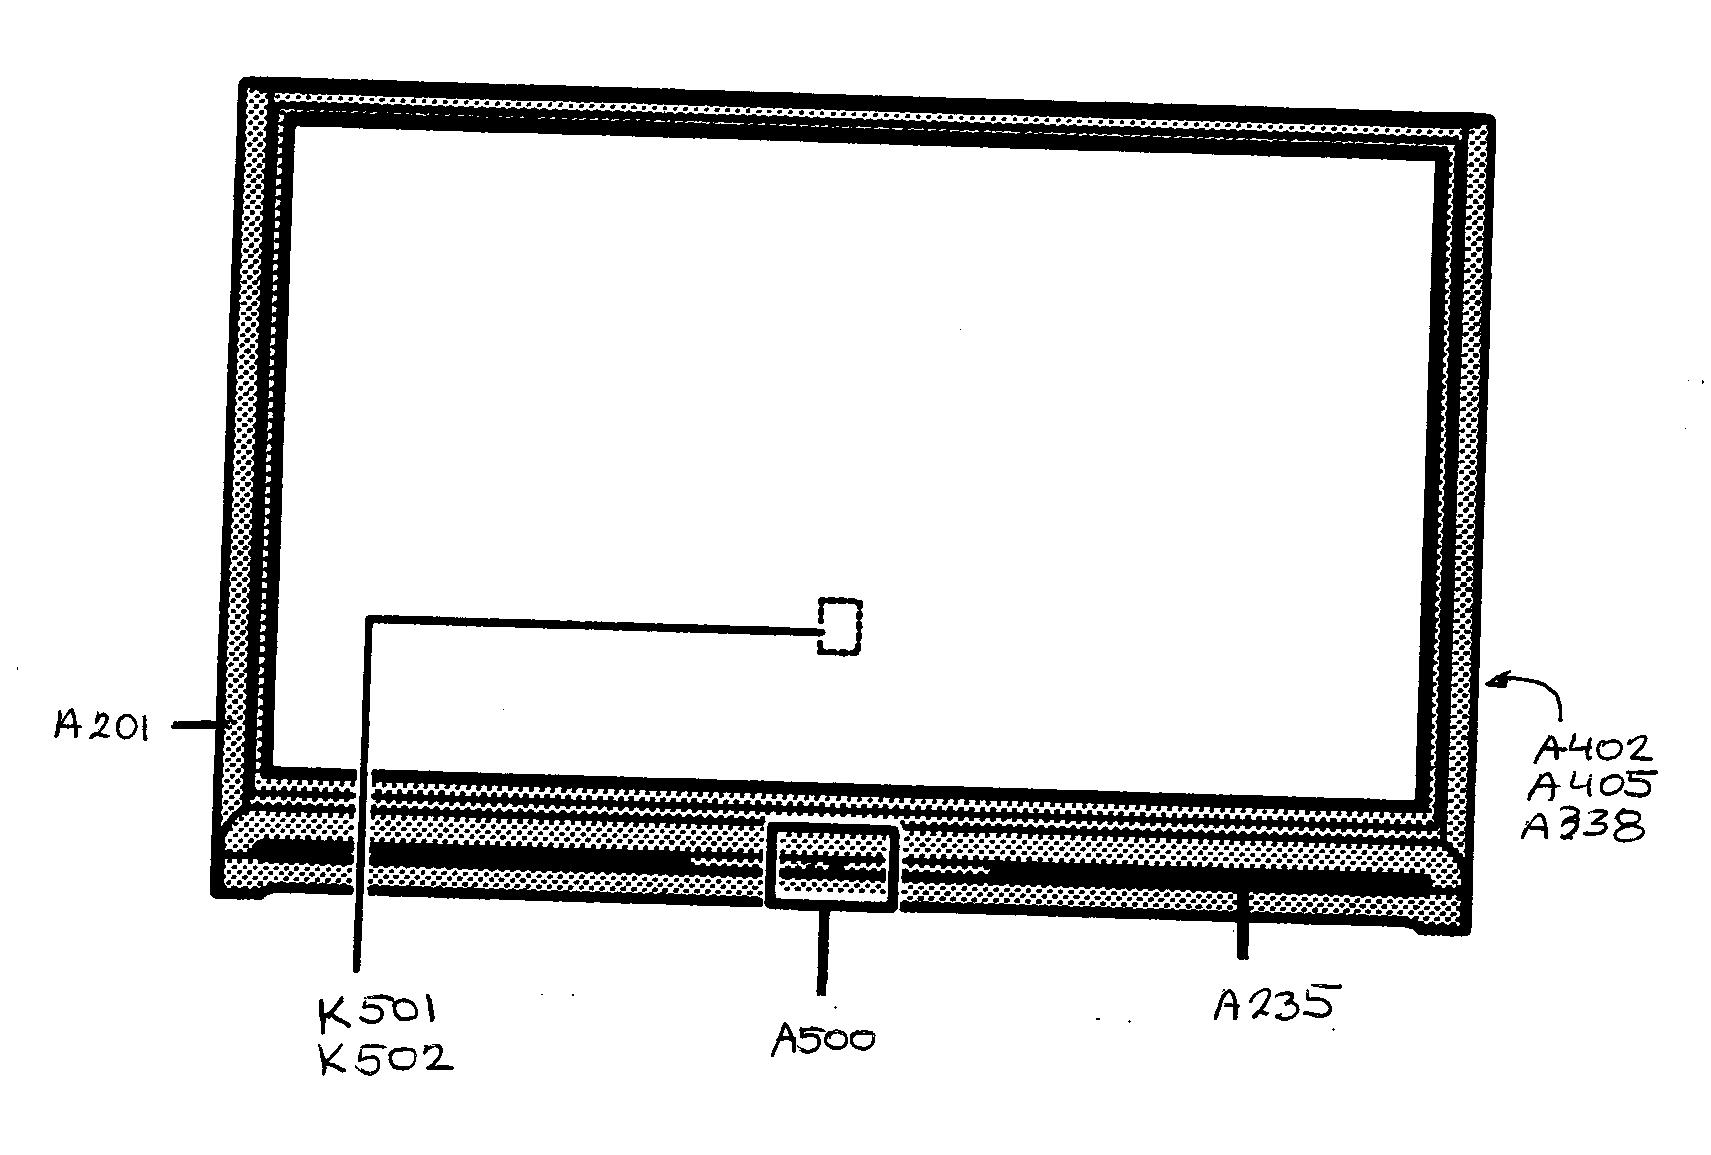 Toshiba model 65HM167 dlp television genuine parts